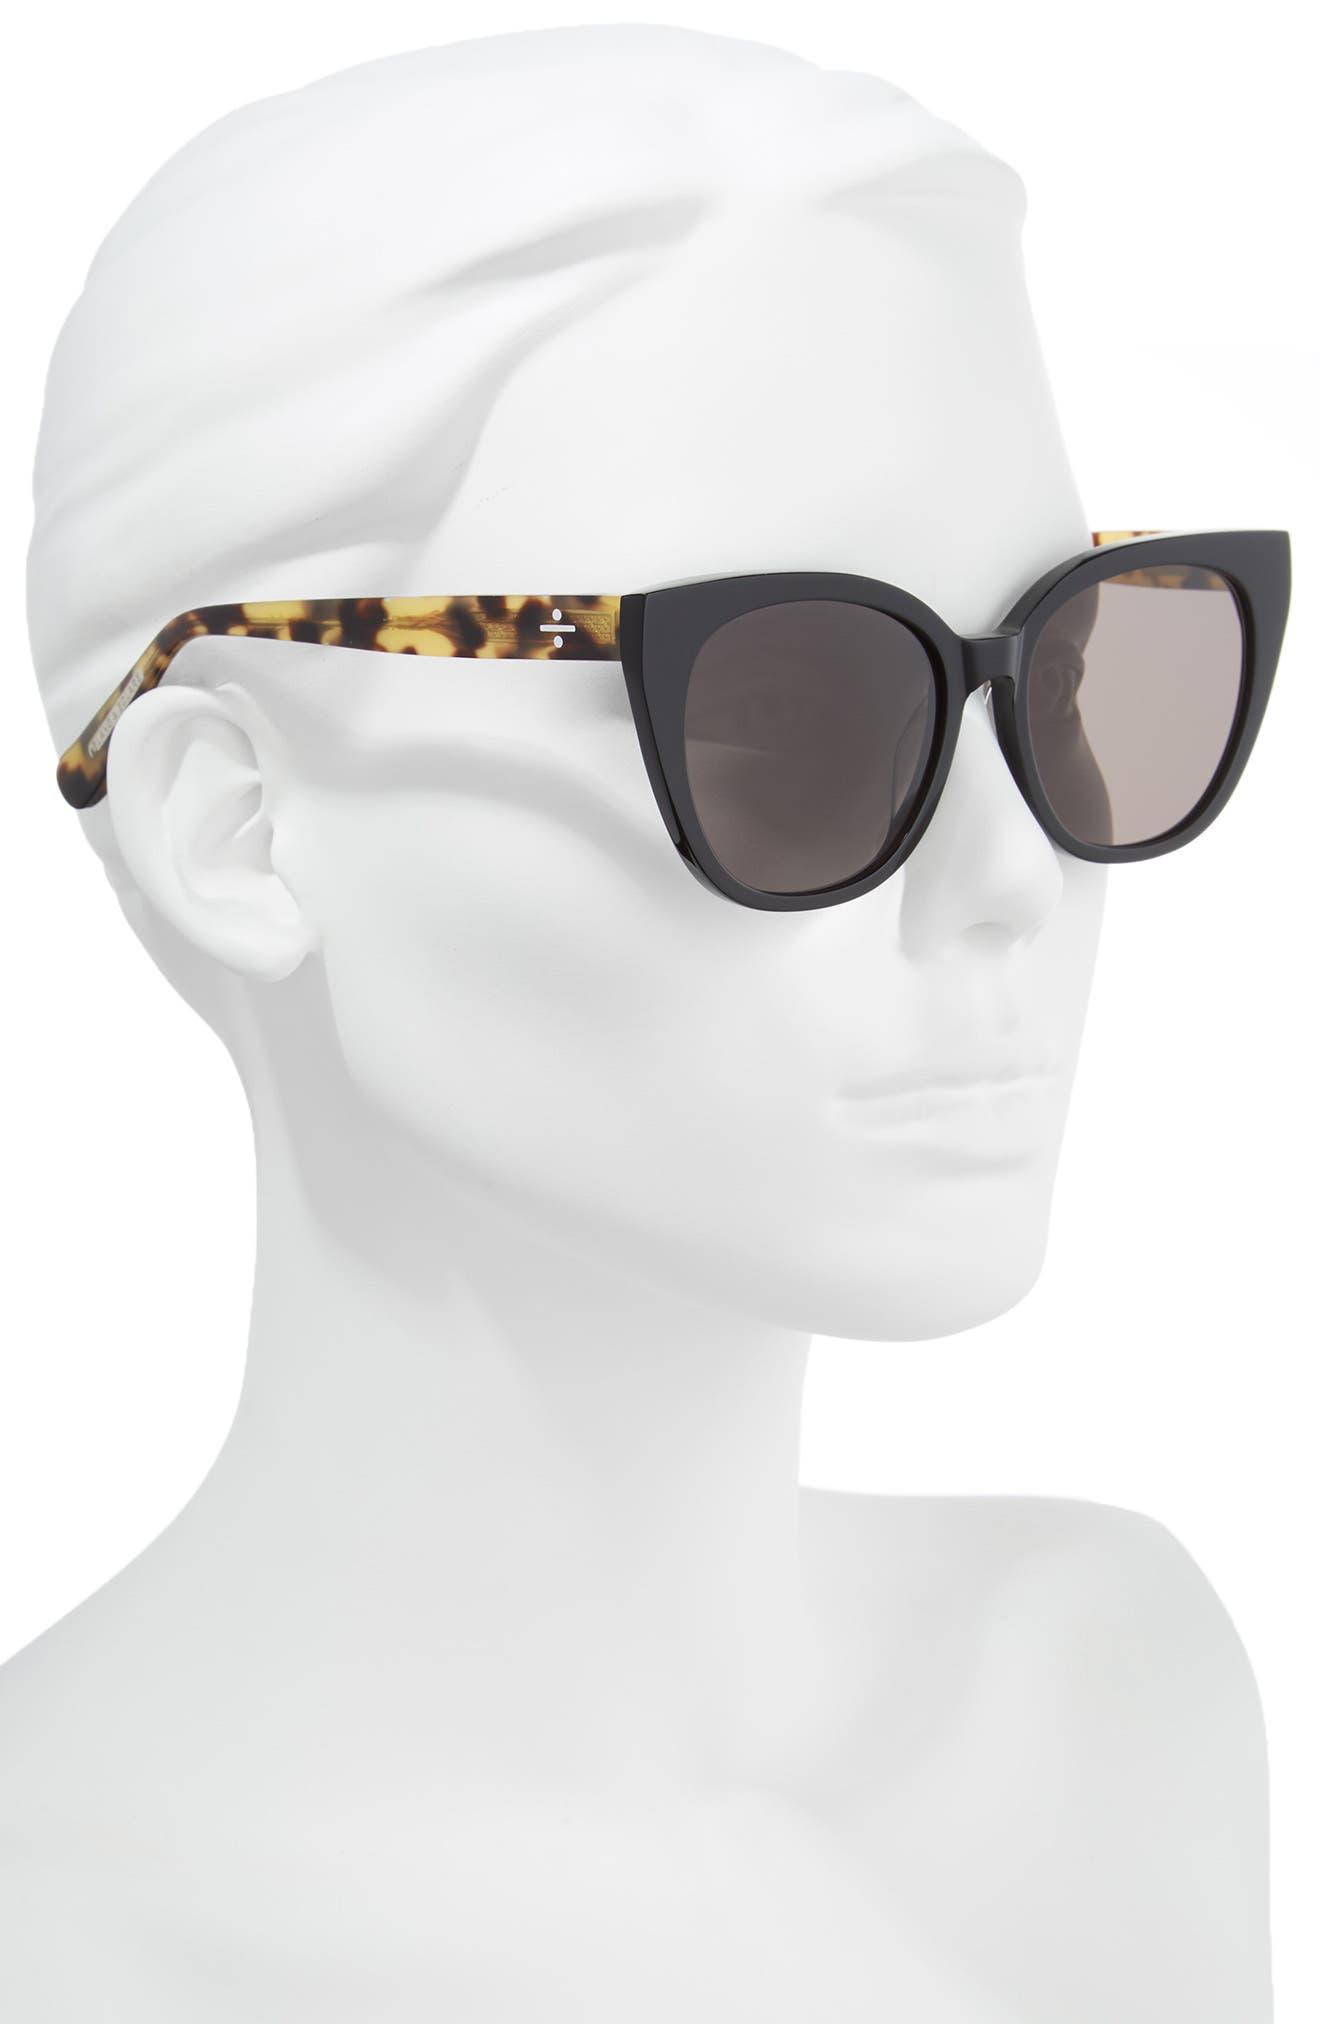 BLANC & ECLARE Monaco 54mm Cat Eye Sunglasses,                             Alternate thumbnail 2, color,                             Black/ Lemon Tortoise/ Grey